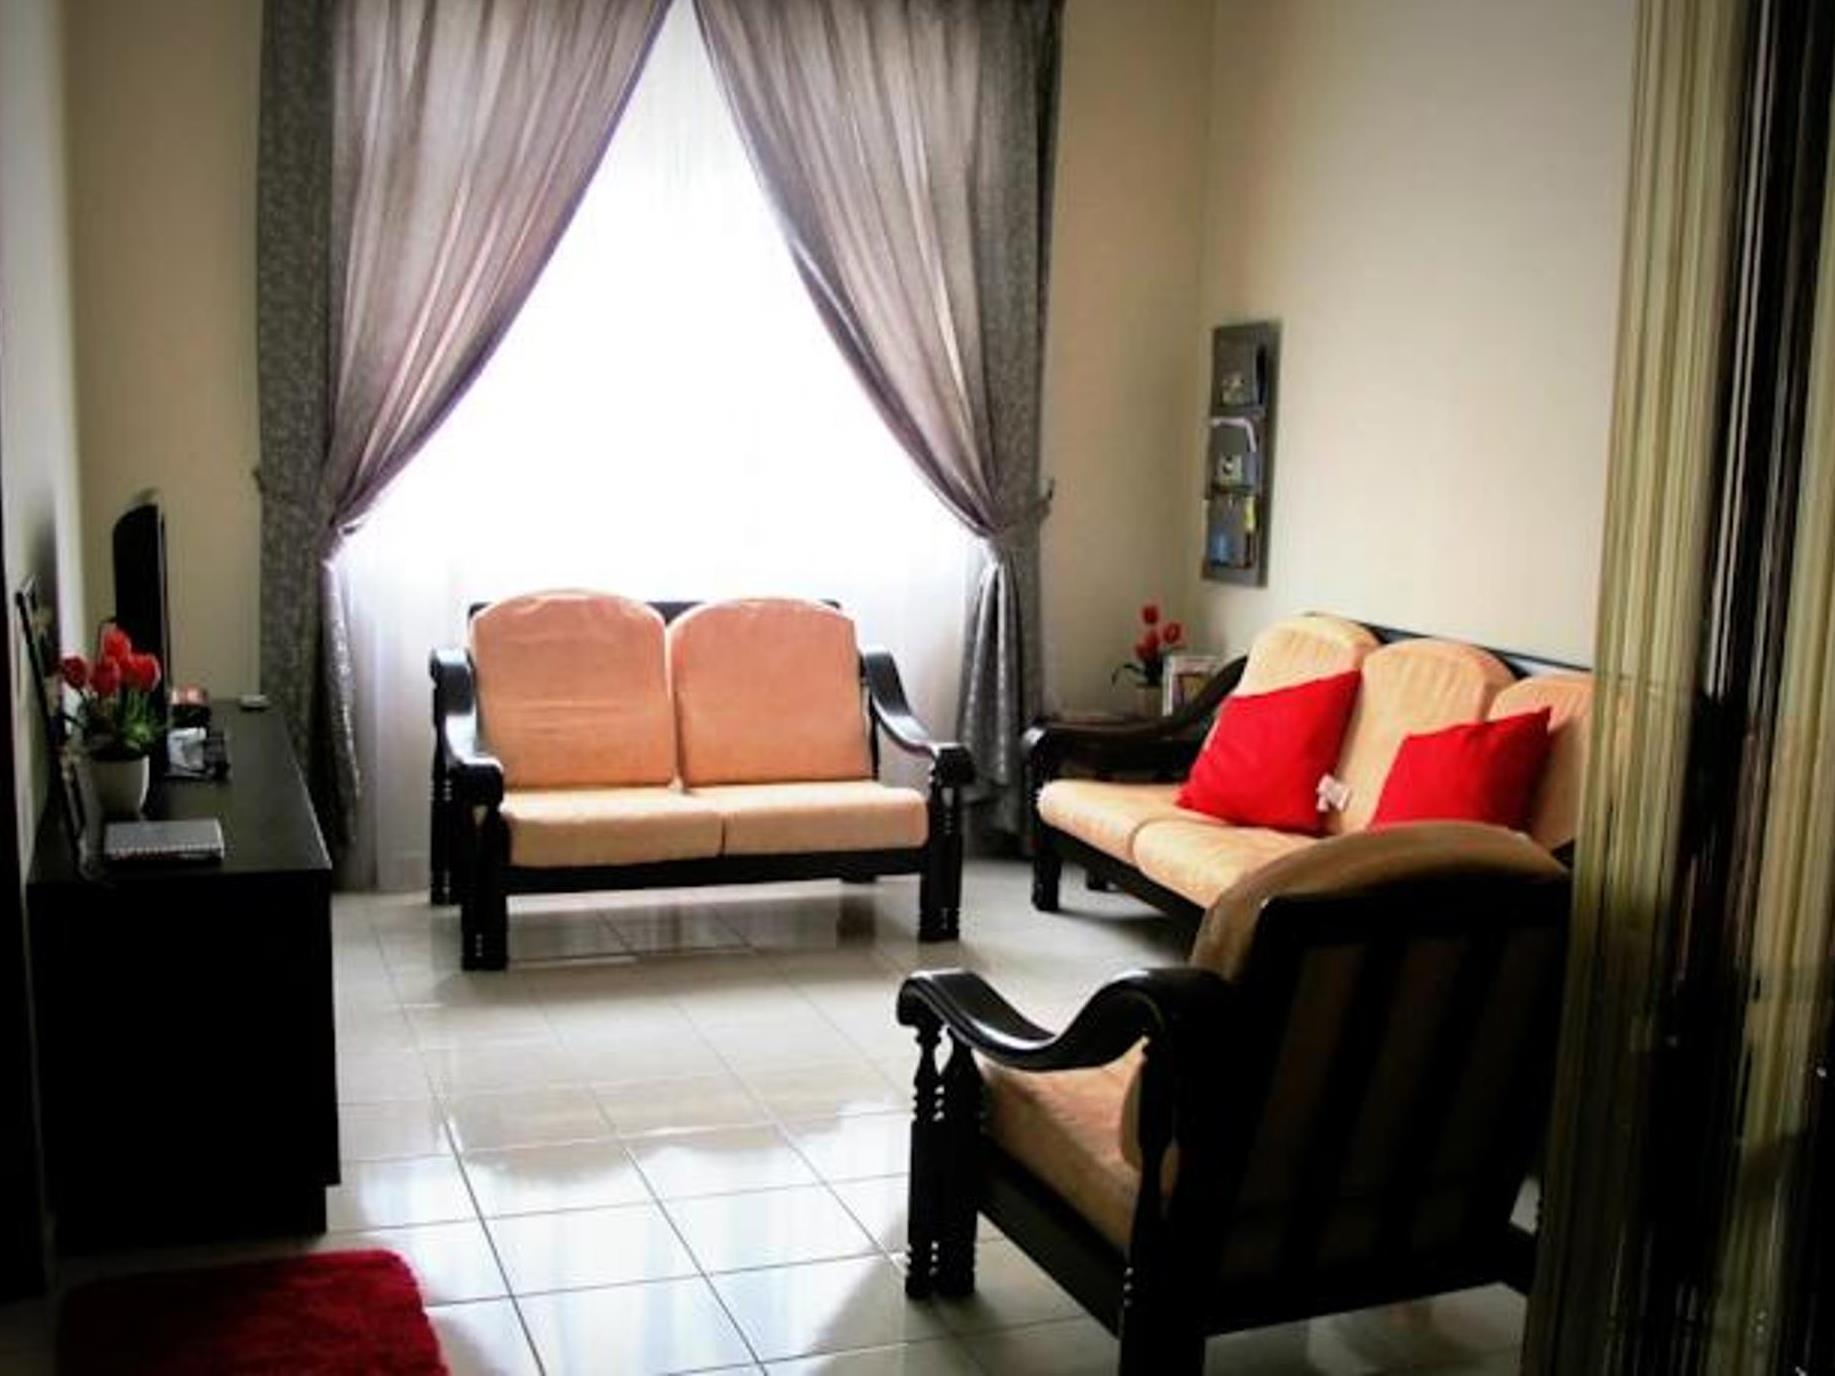 Szhnn Vacation Apartment, Kota Kinabalu